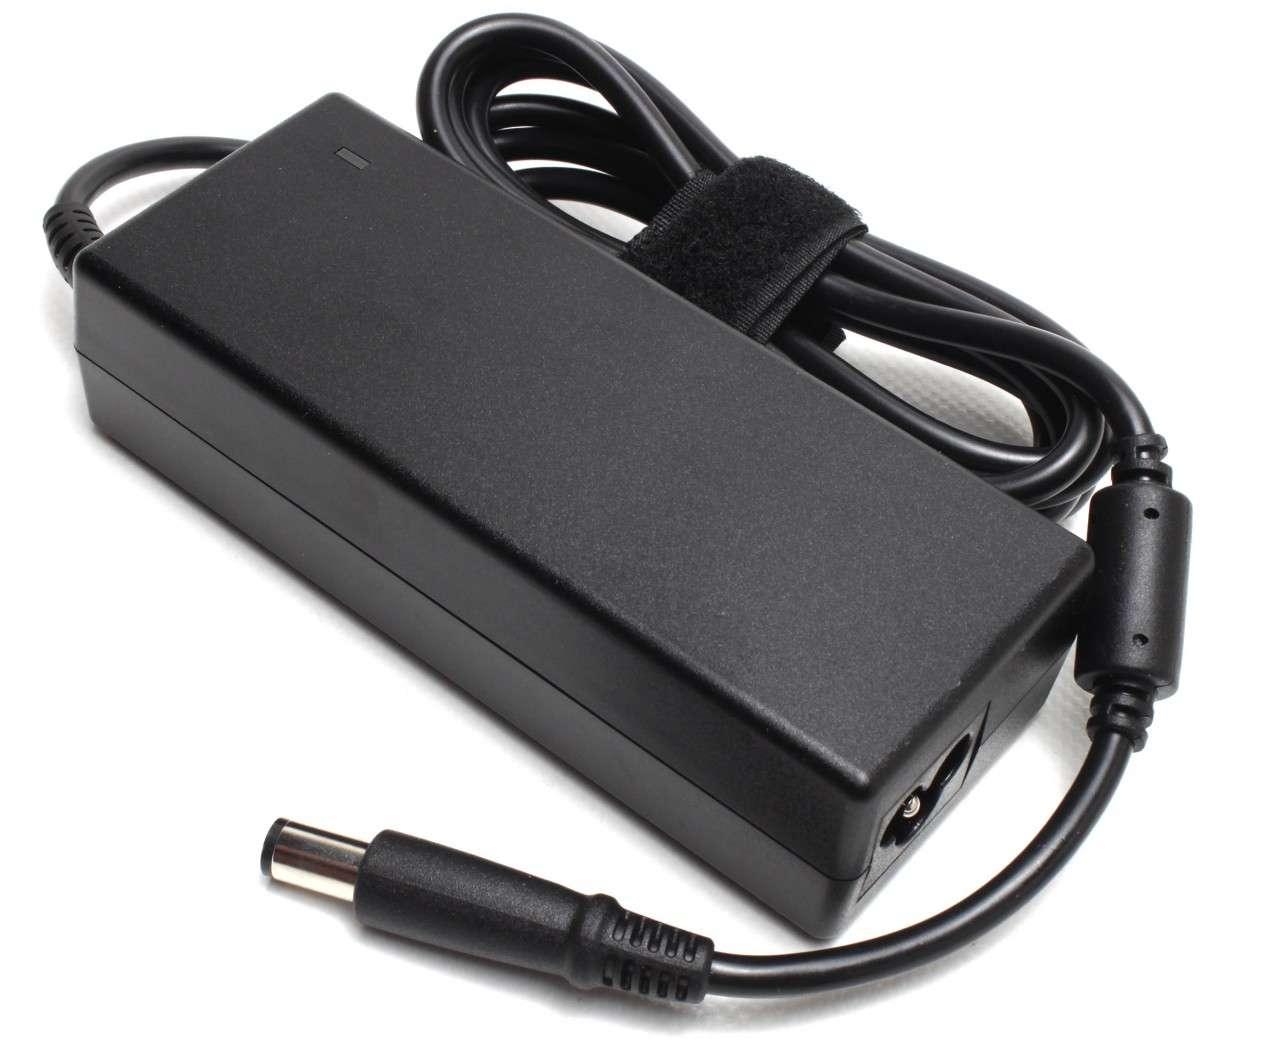 Incarcator Dell Inspiron 8600c VARIANTA 3 imagine powerlaptop.ro 2021